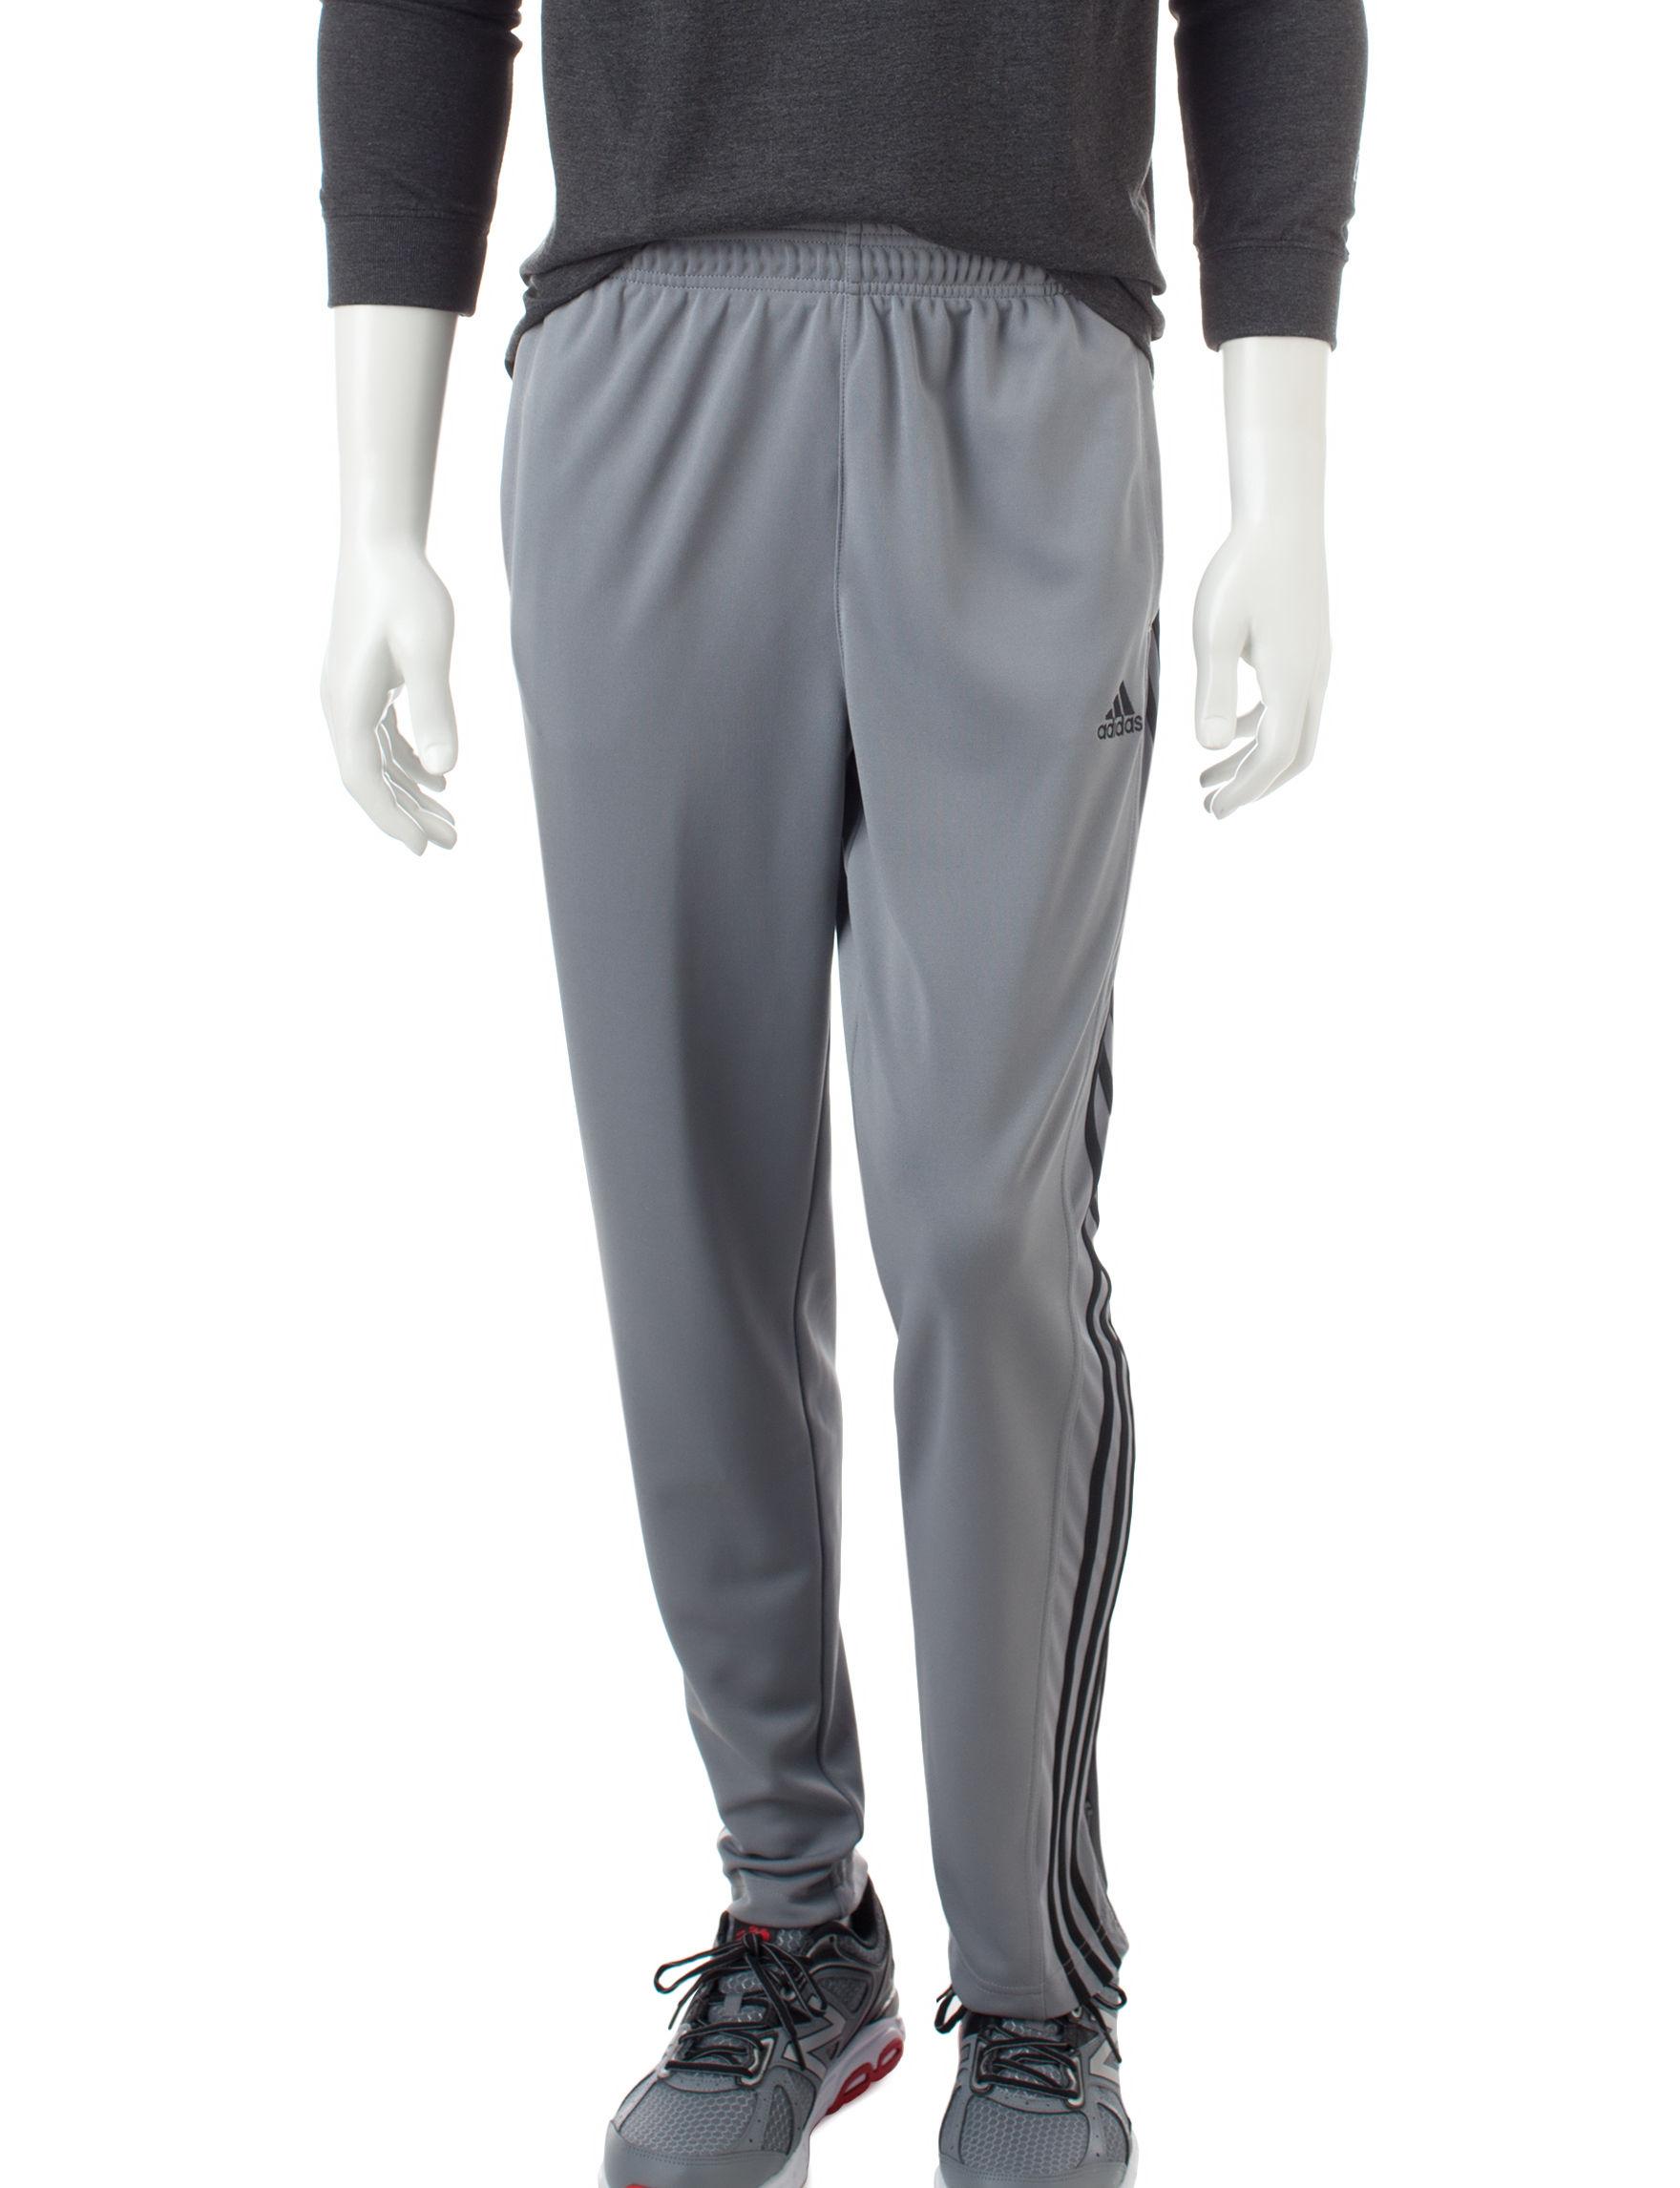 Adidas Grey / Black Tapered